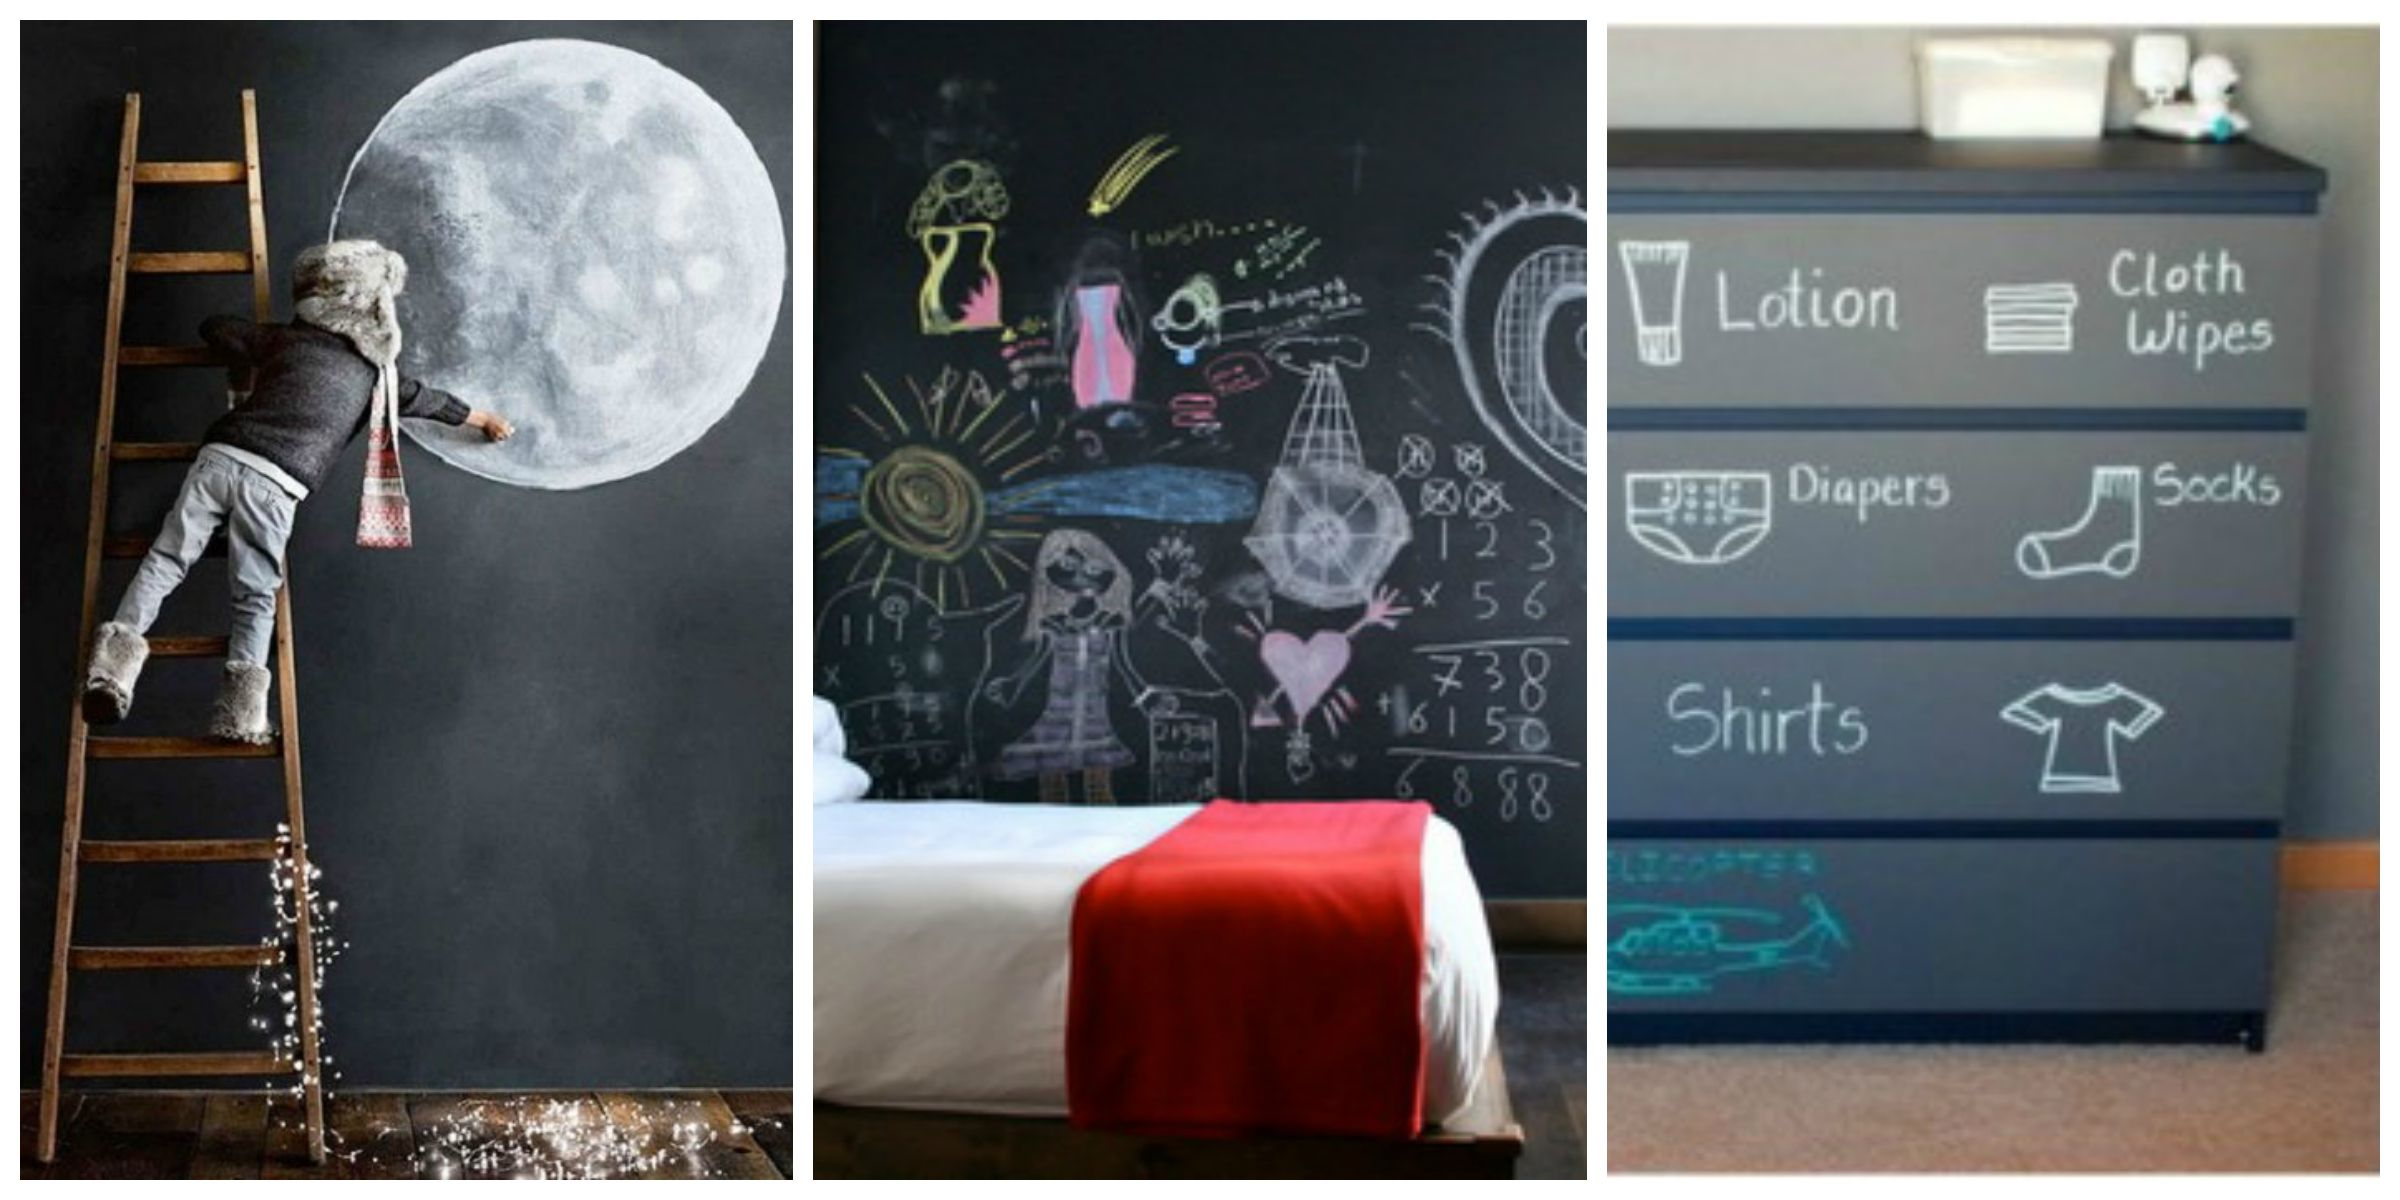 Chalk Paint Efecto Pizarra Necesitamos Pared O Mueble Para Pintar,